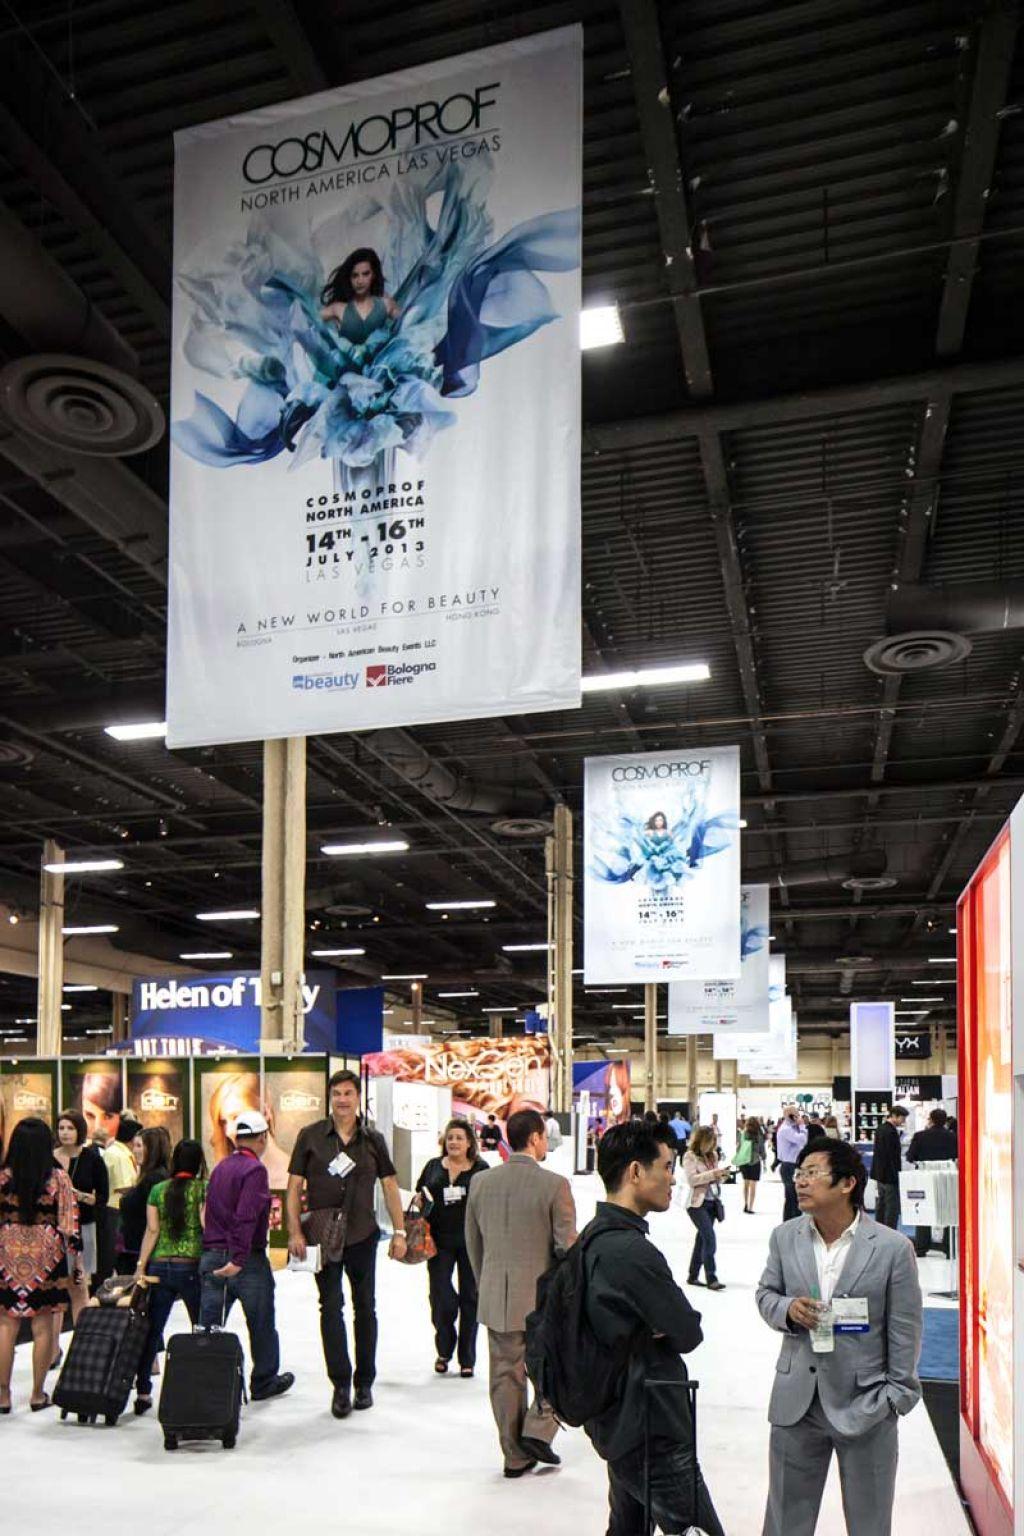 Las Vegas Exhibition Hall At Cosmoprof Northamerica